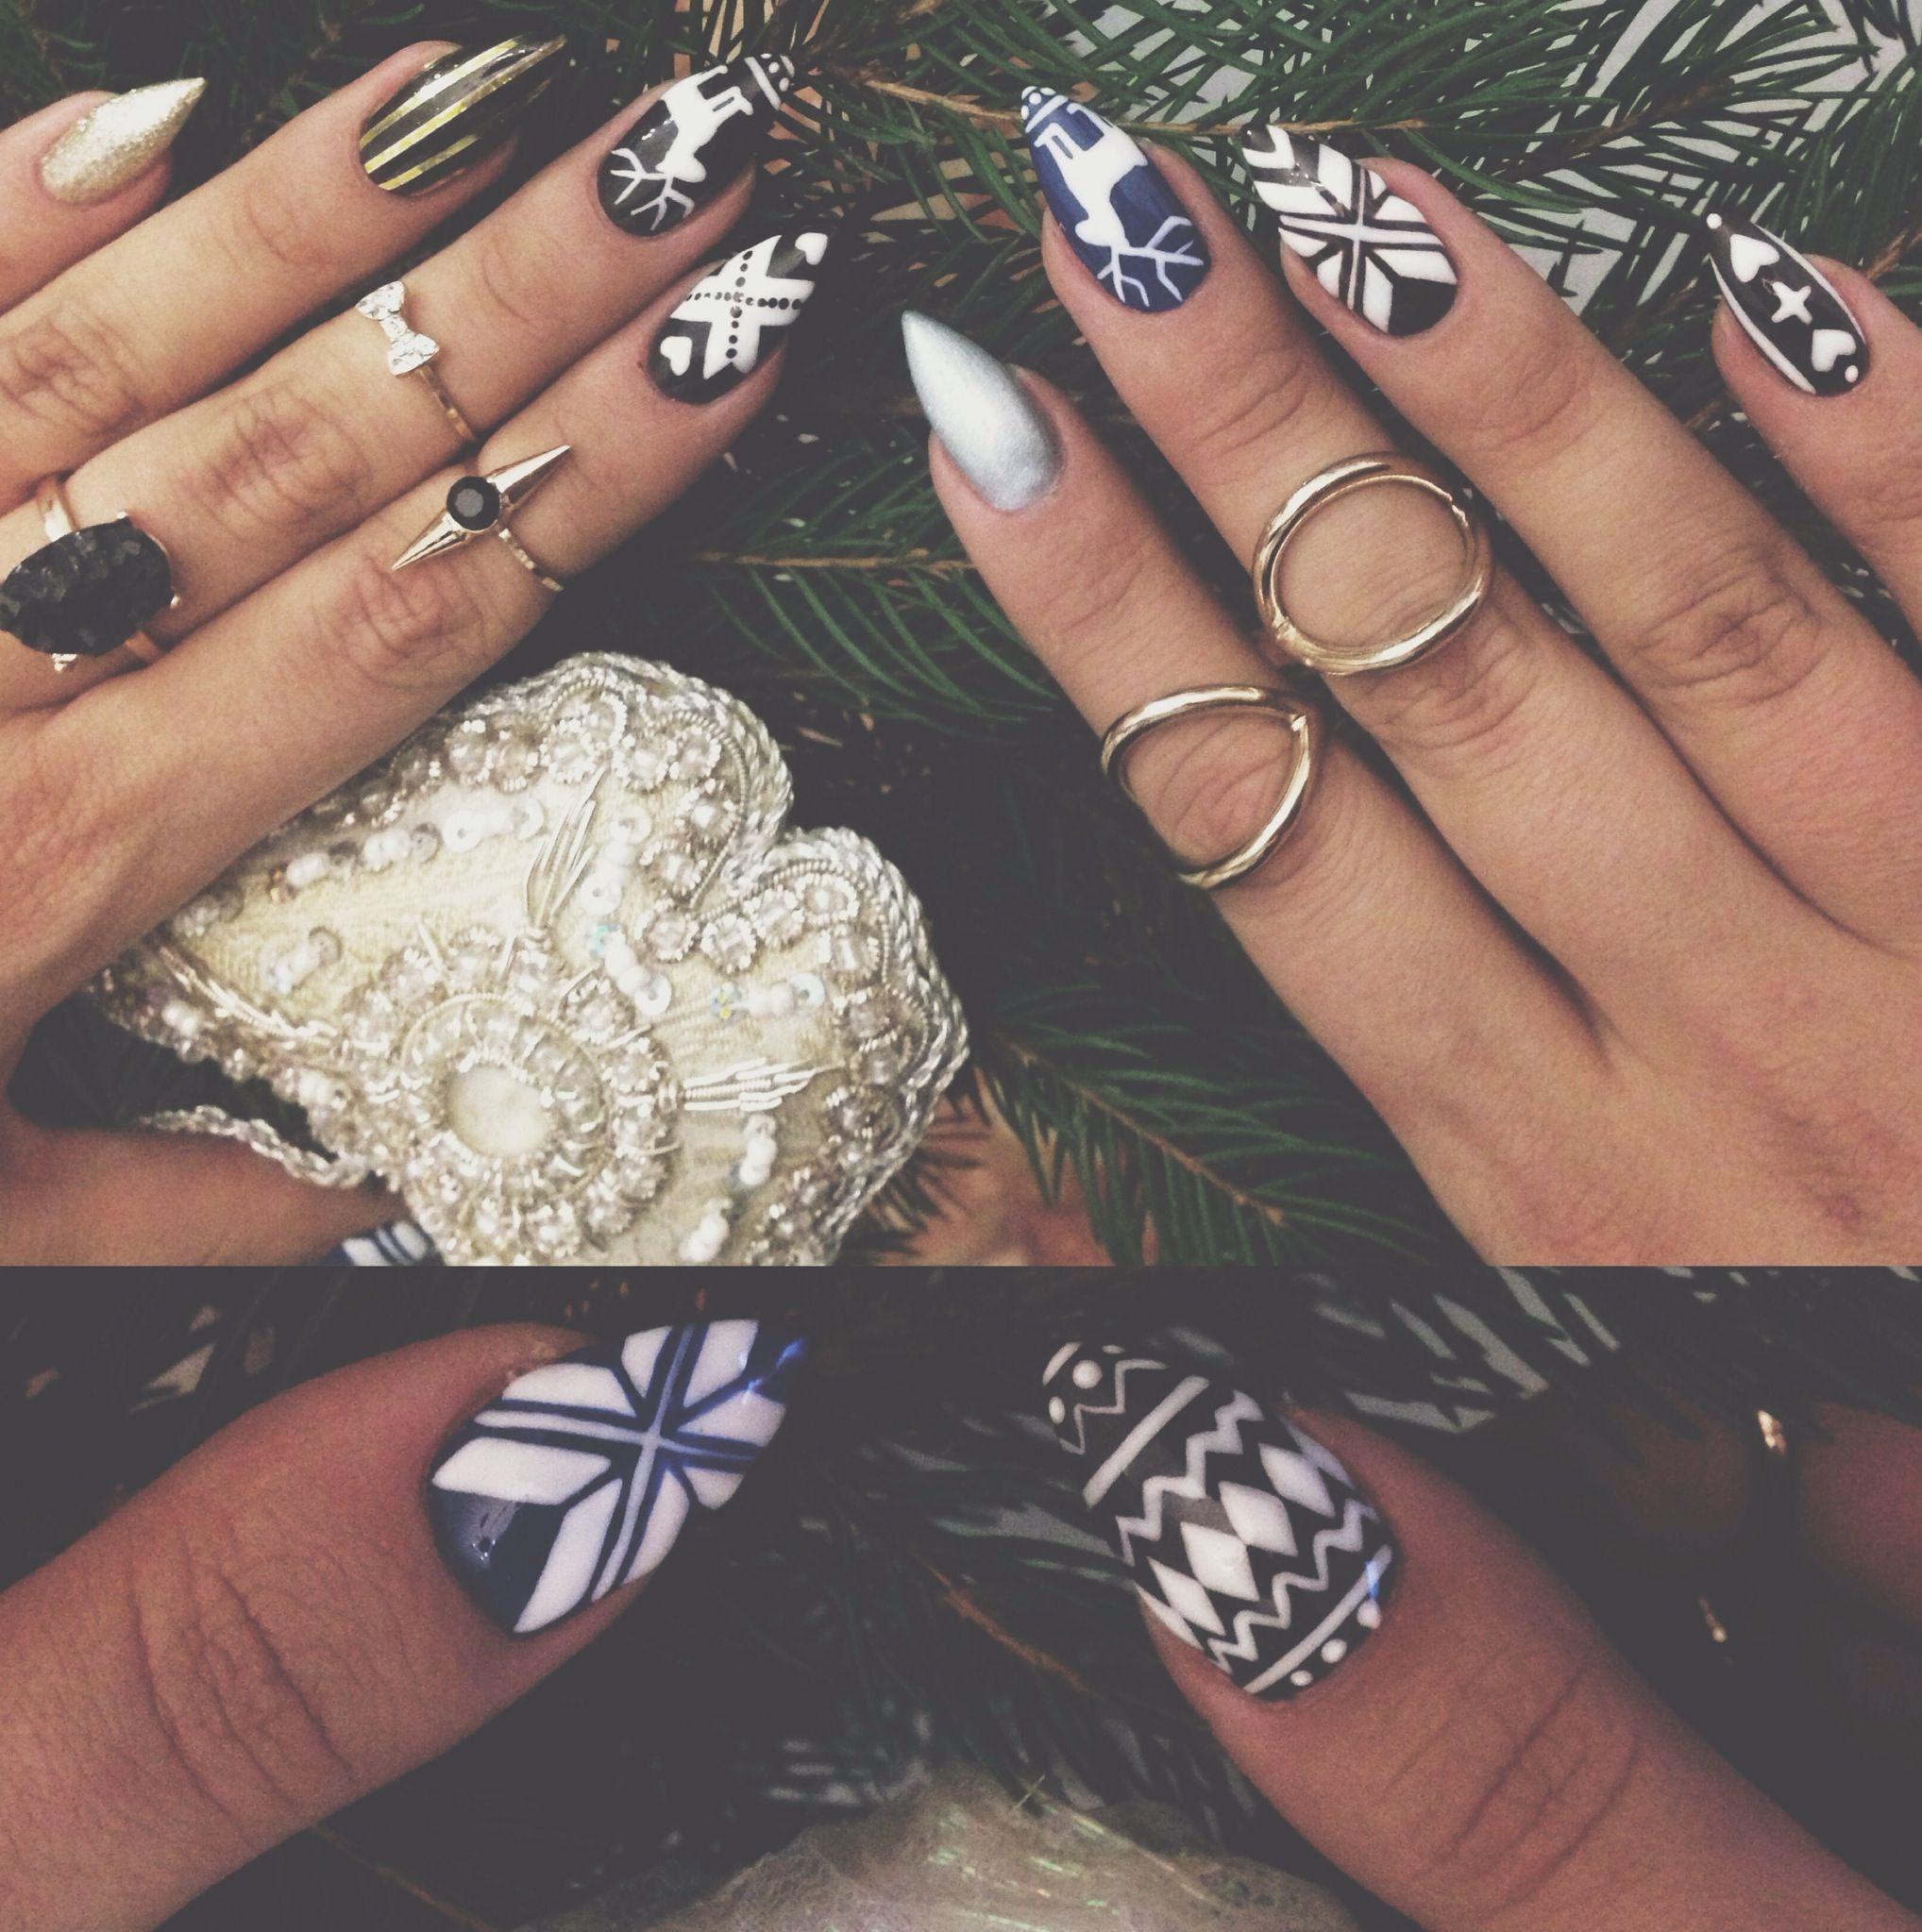 Stiletto Nails By Amelina Anna Winter Nail Designs 2014 Nail Art